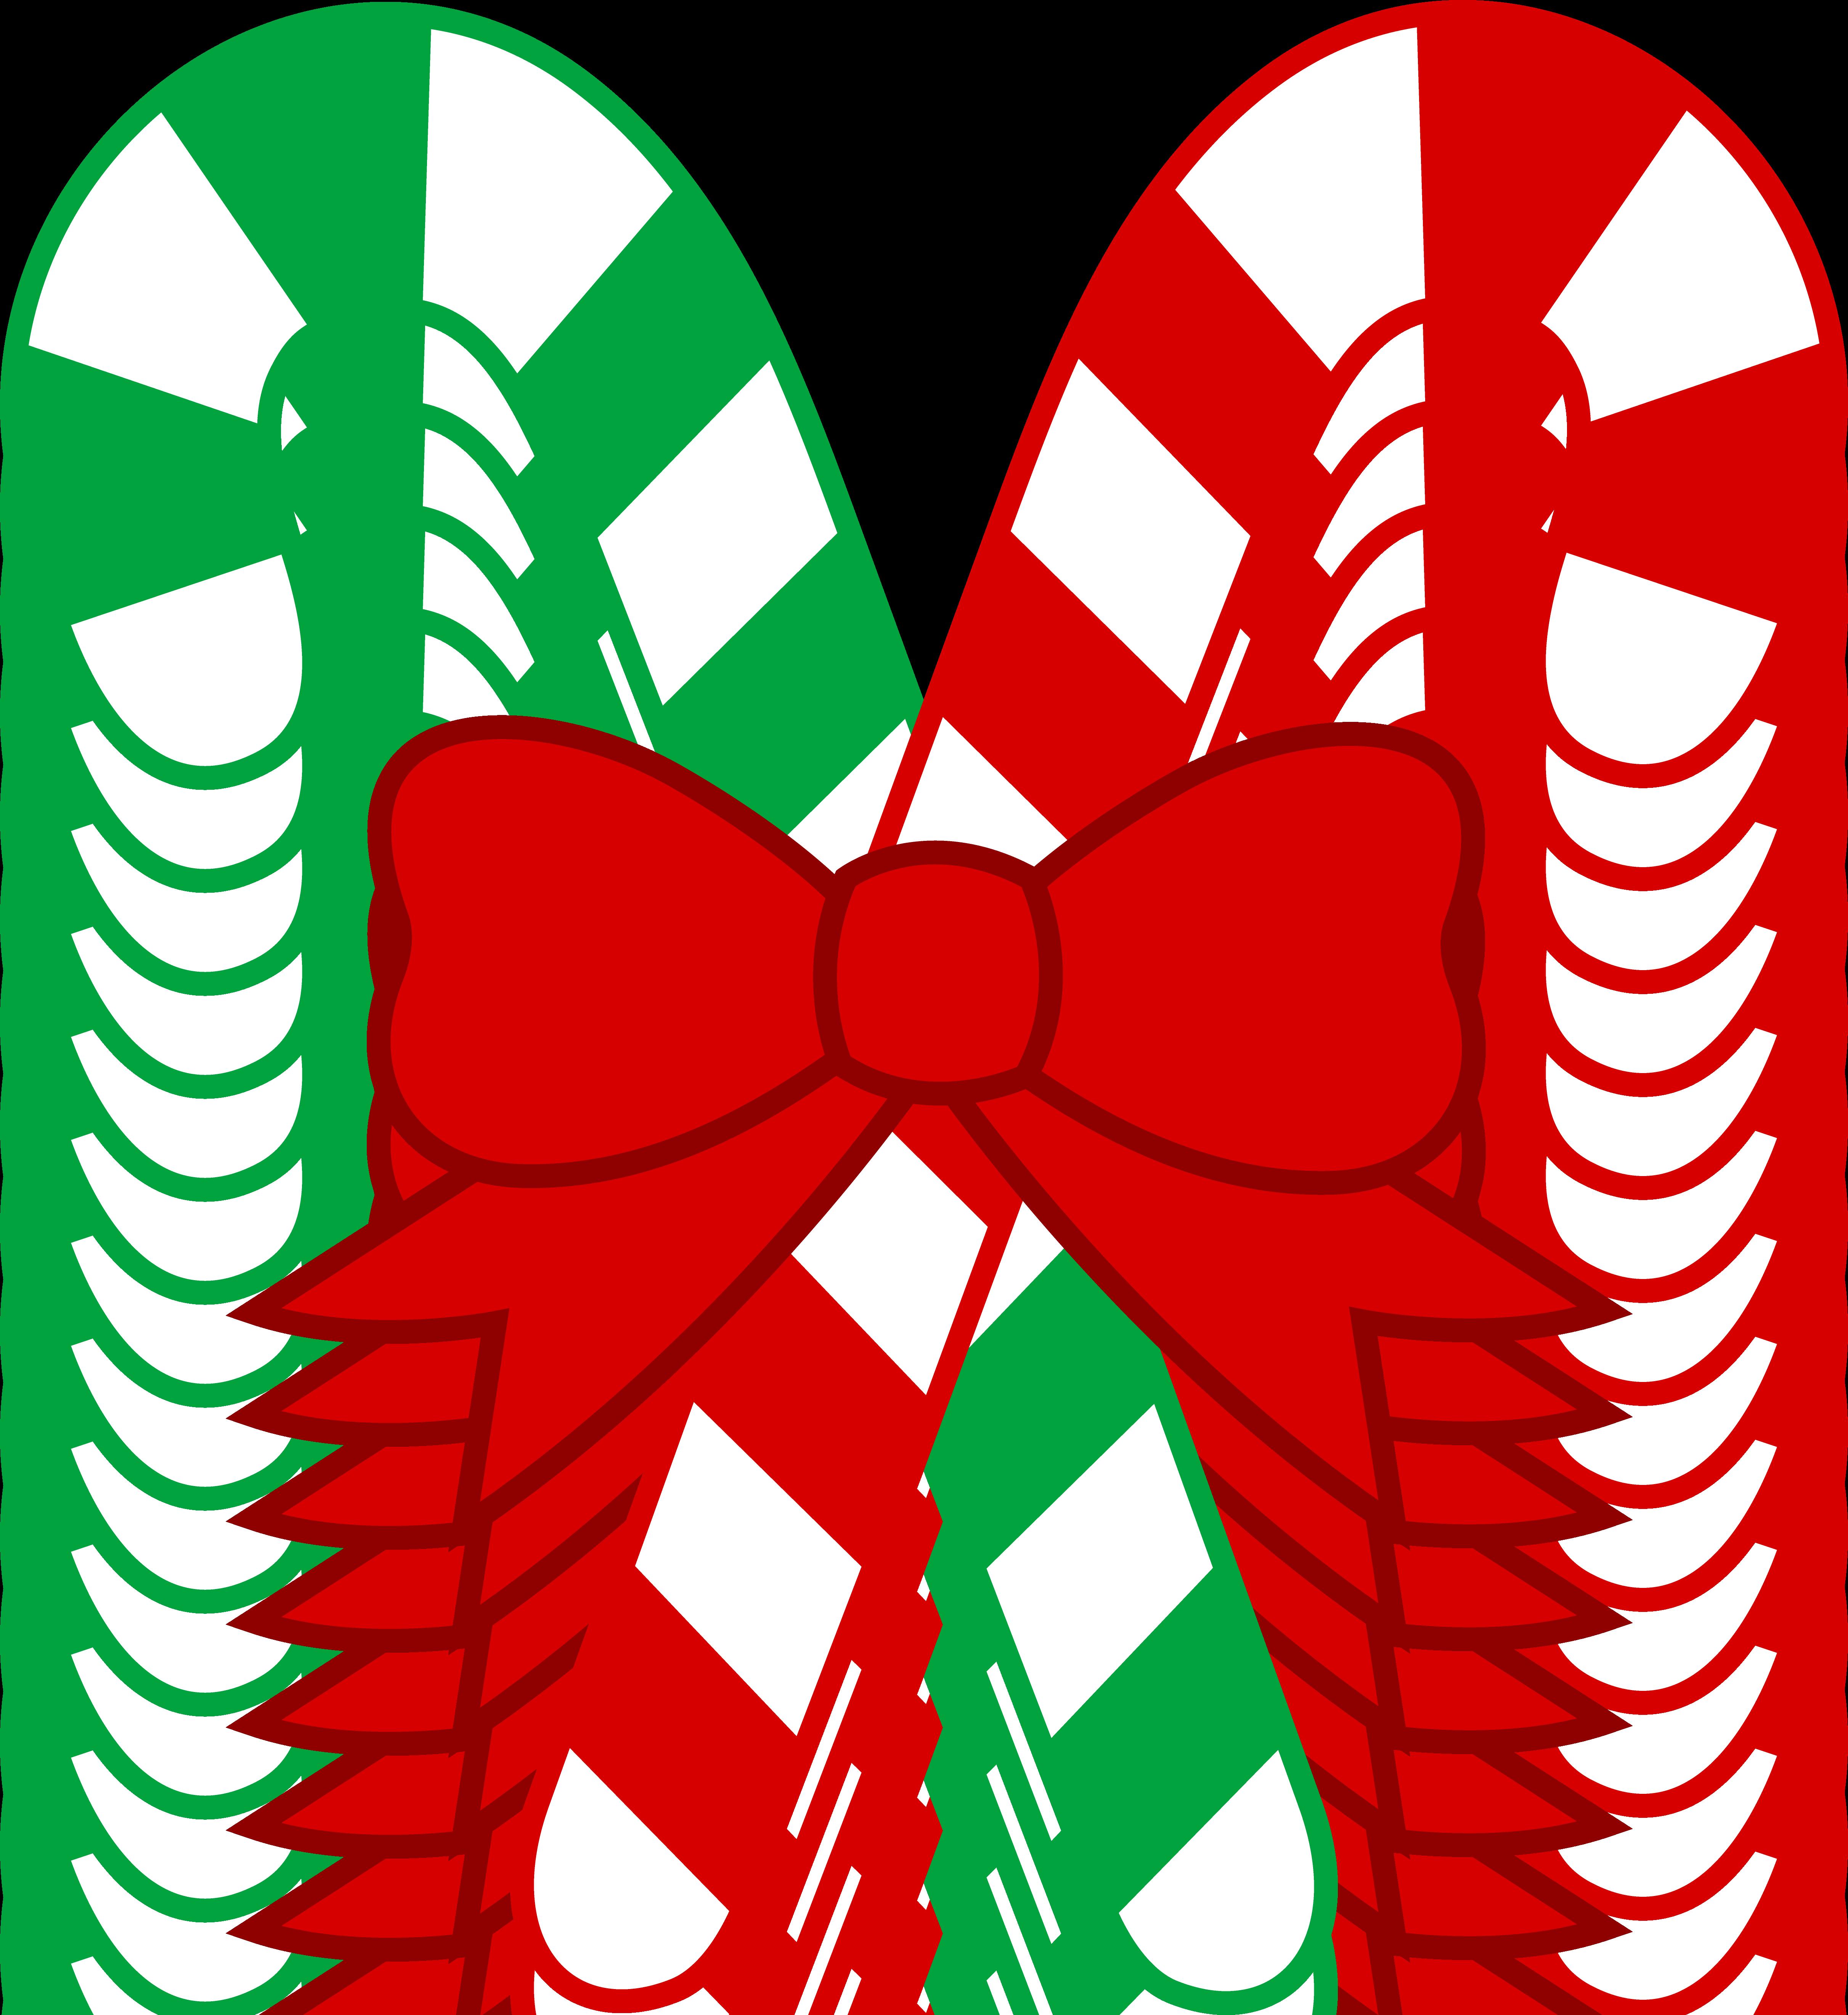 Holidays Christmas Candy .-Holidays Christmas Candy .-16